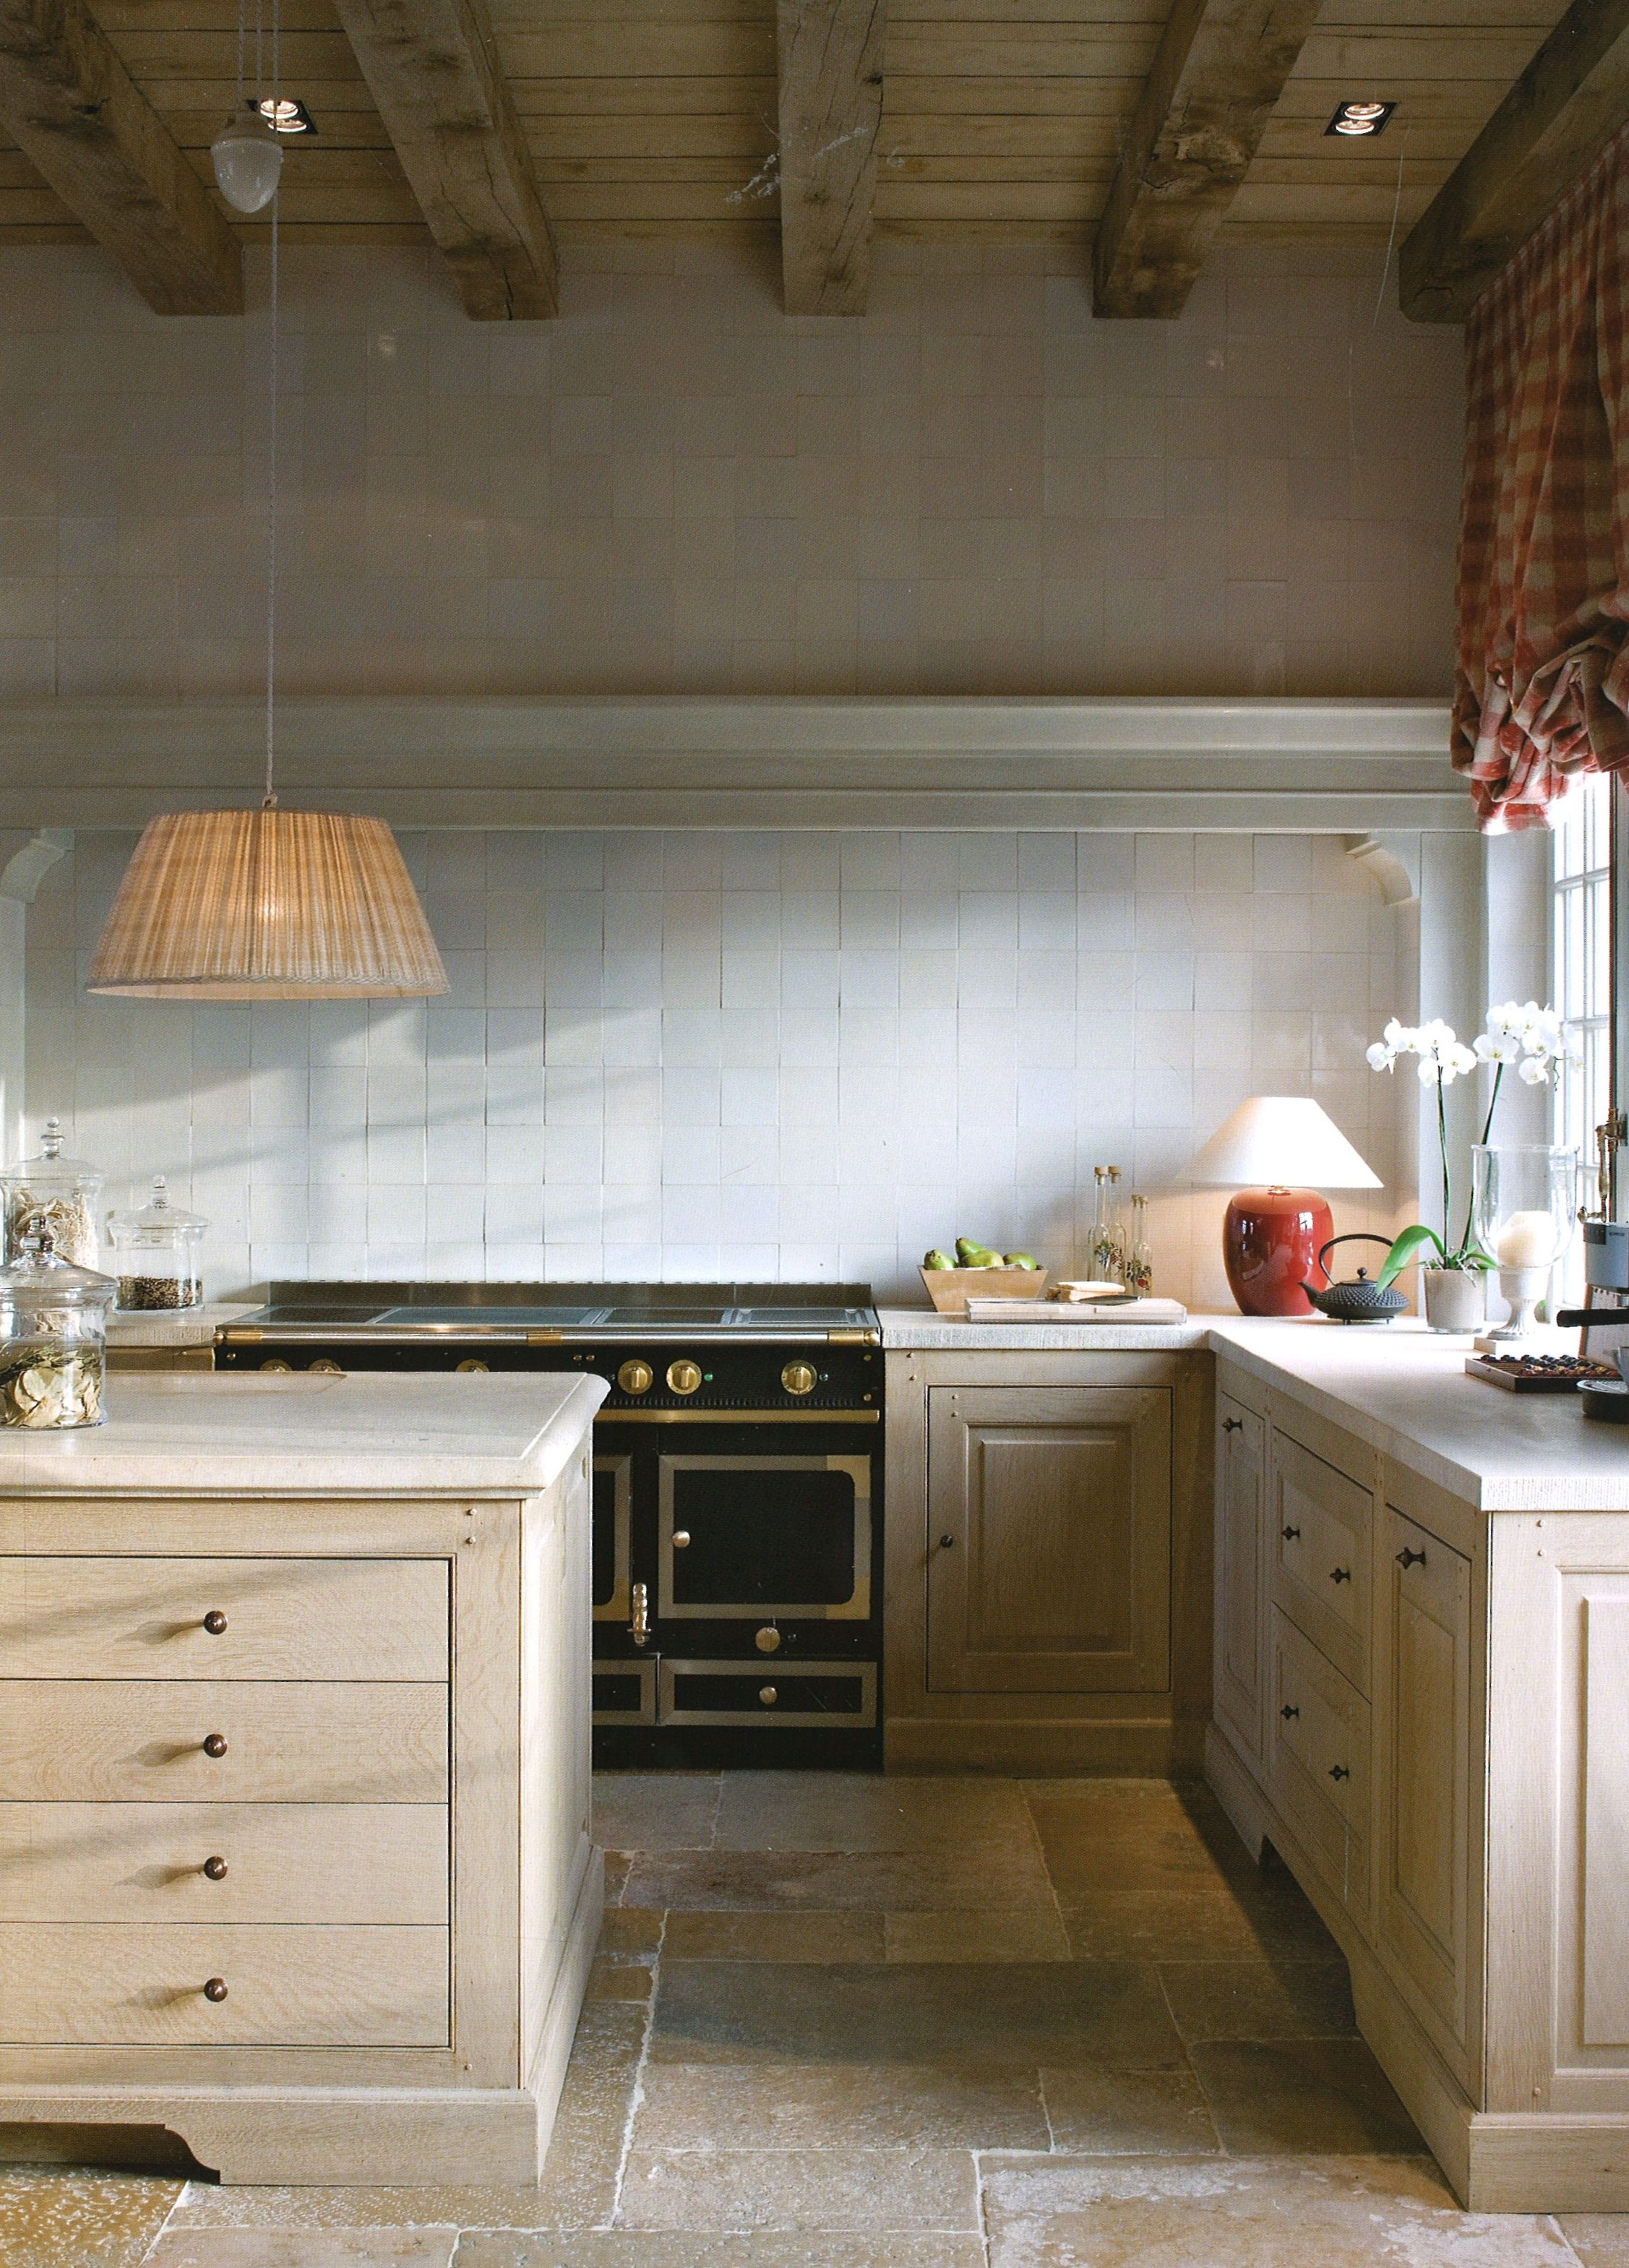 Red Elements Kitchen Cabinet Finish Fake La Cornue Backsplash